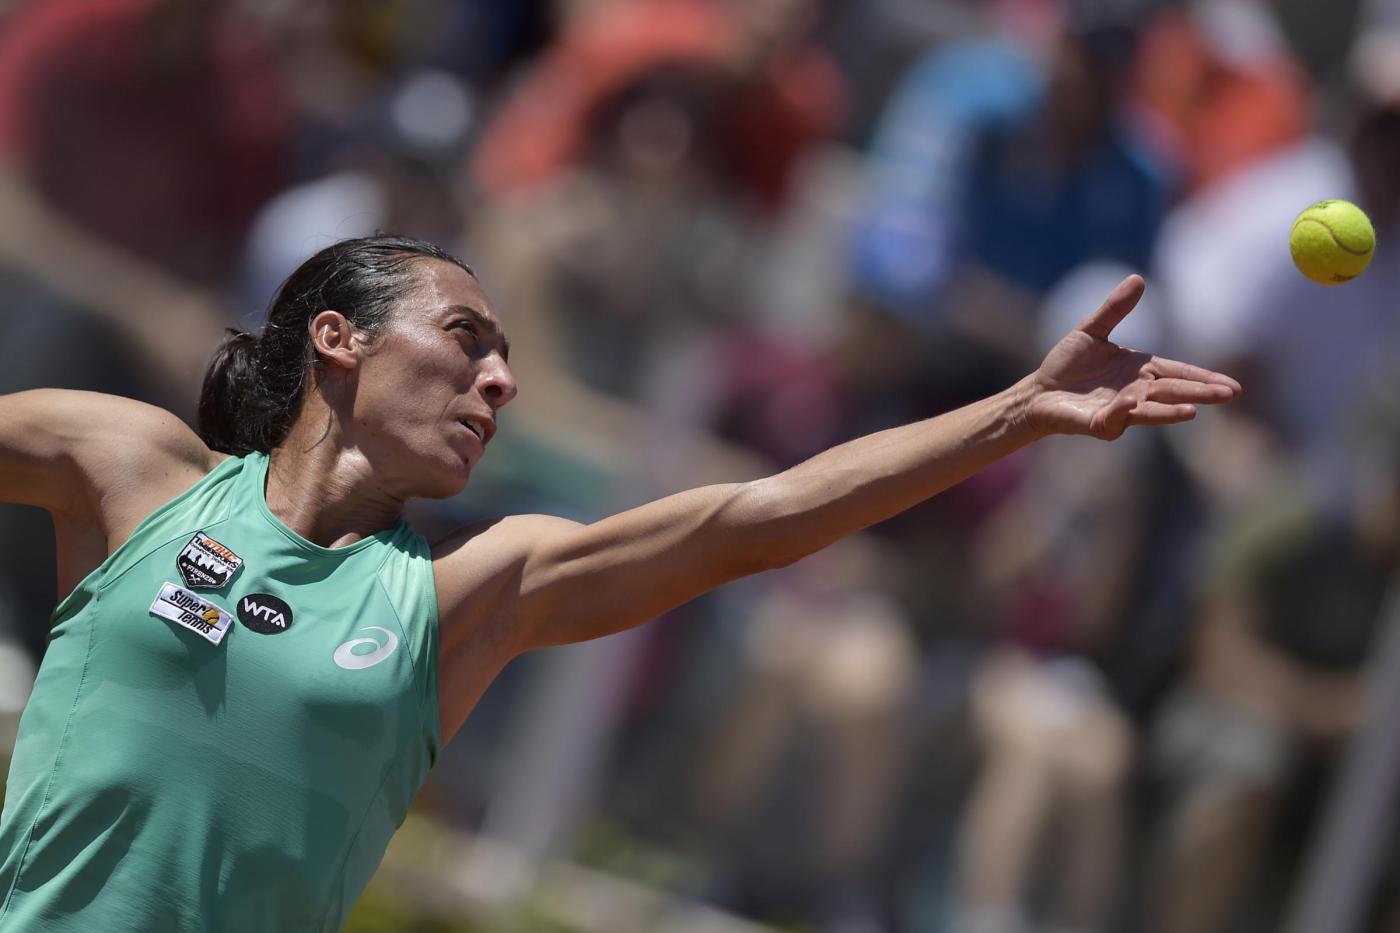 Tennis-Rio Open: Francesca Schiavone è in semifinale, Cindy Burger stesa in tre setFotoGallery